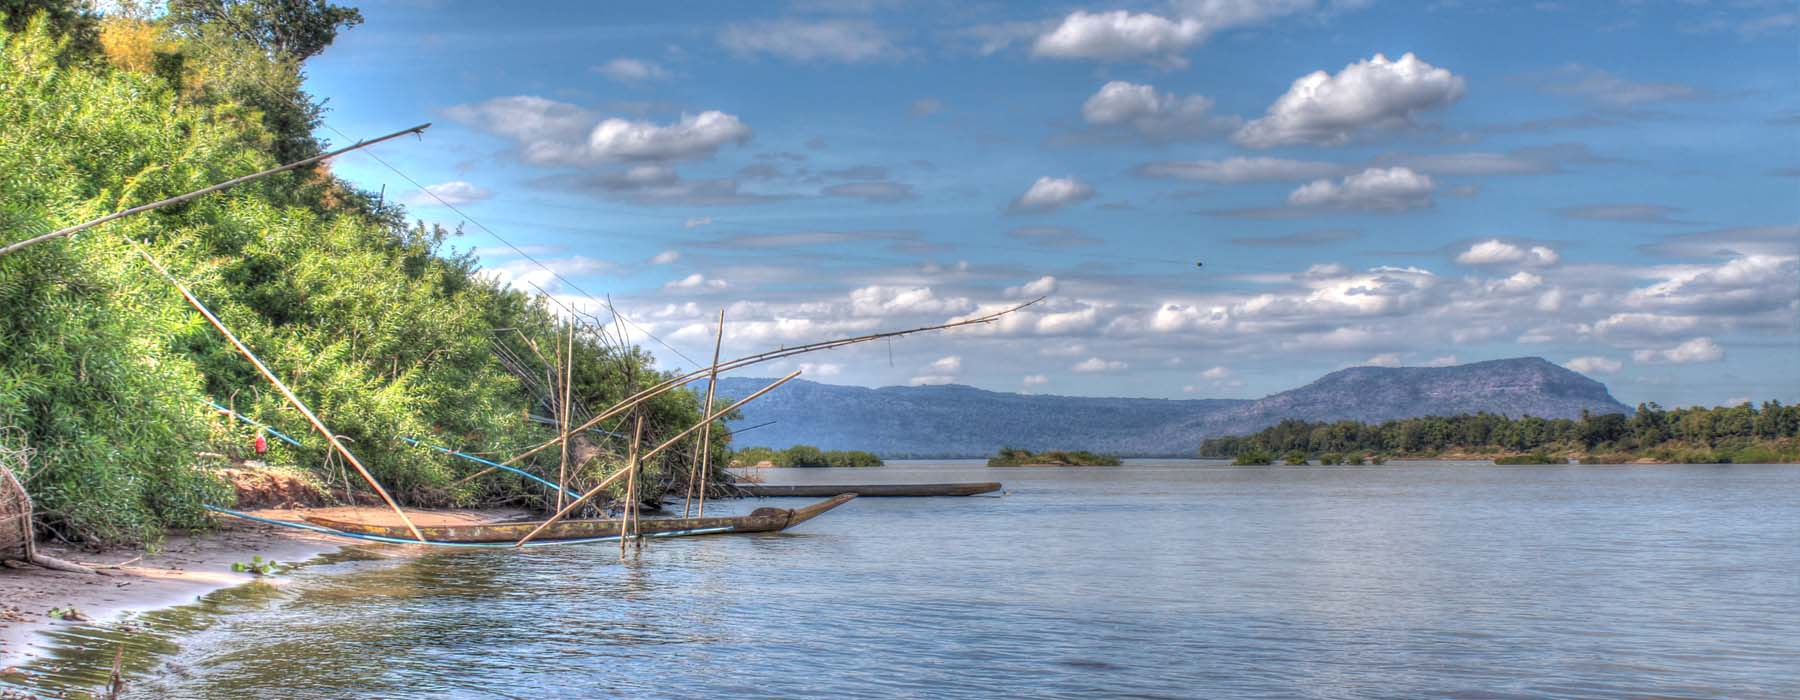 Asien-Laos-Reisen-Touren-Reiseagentur